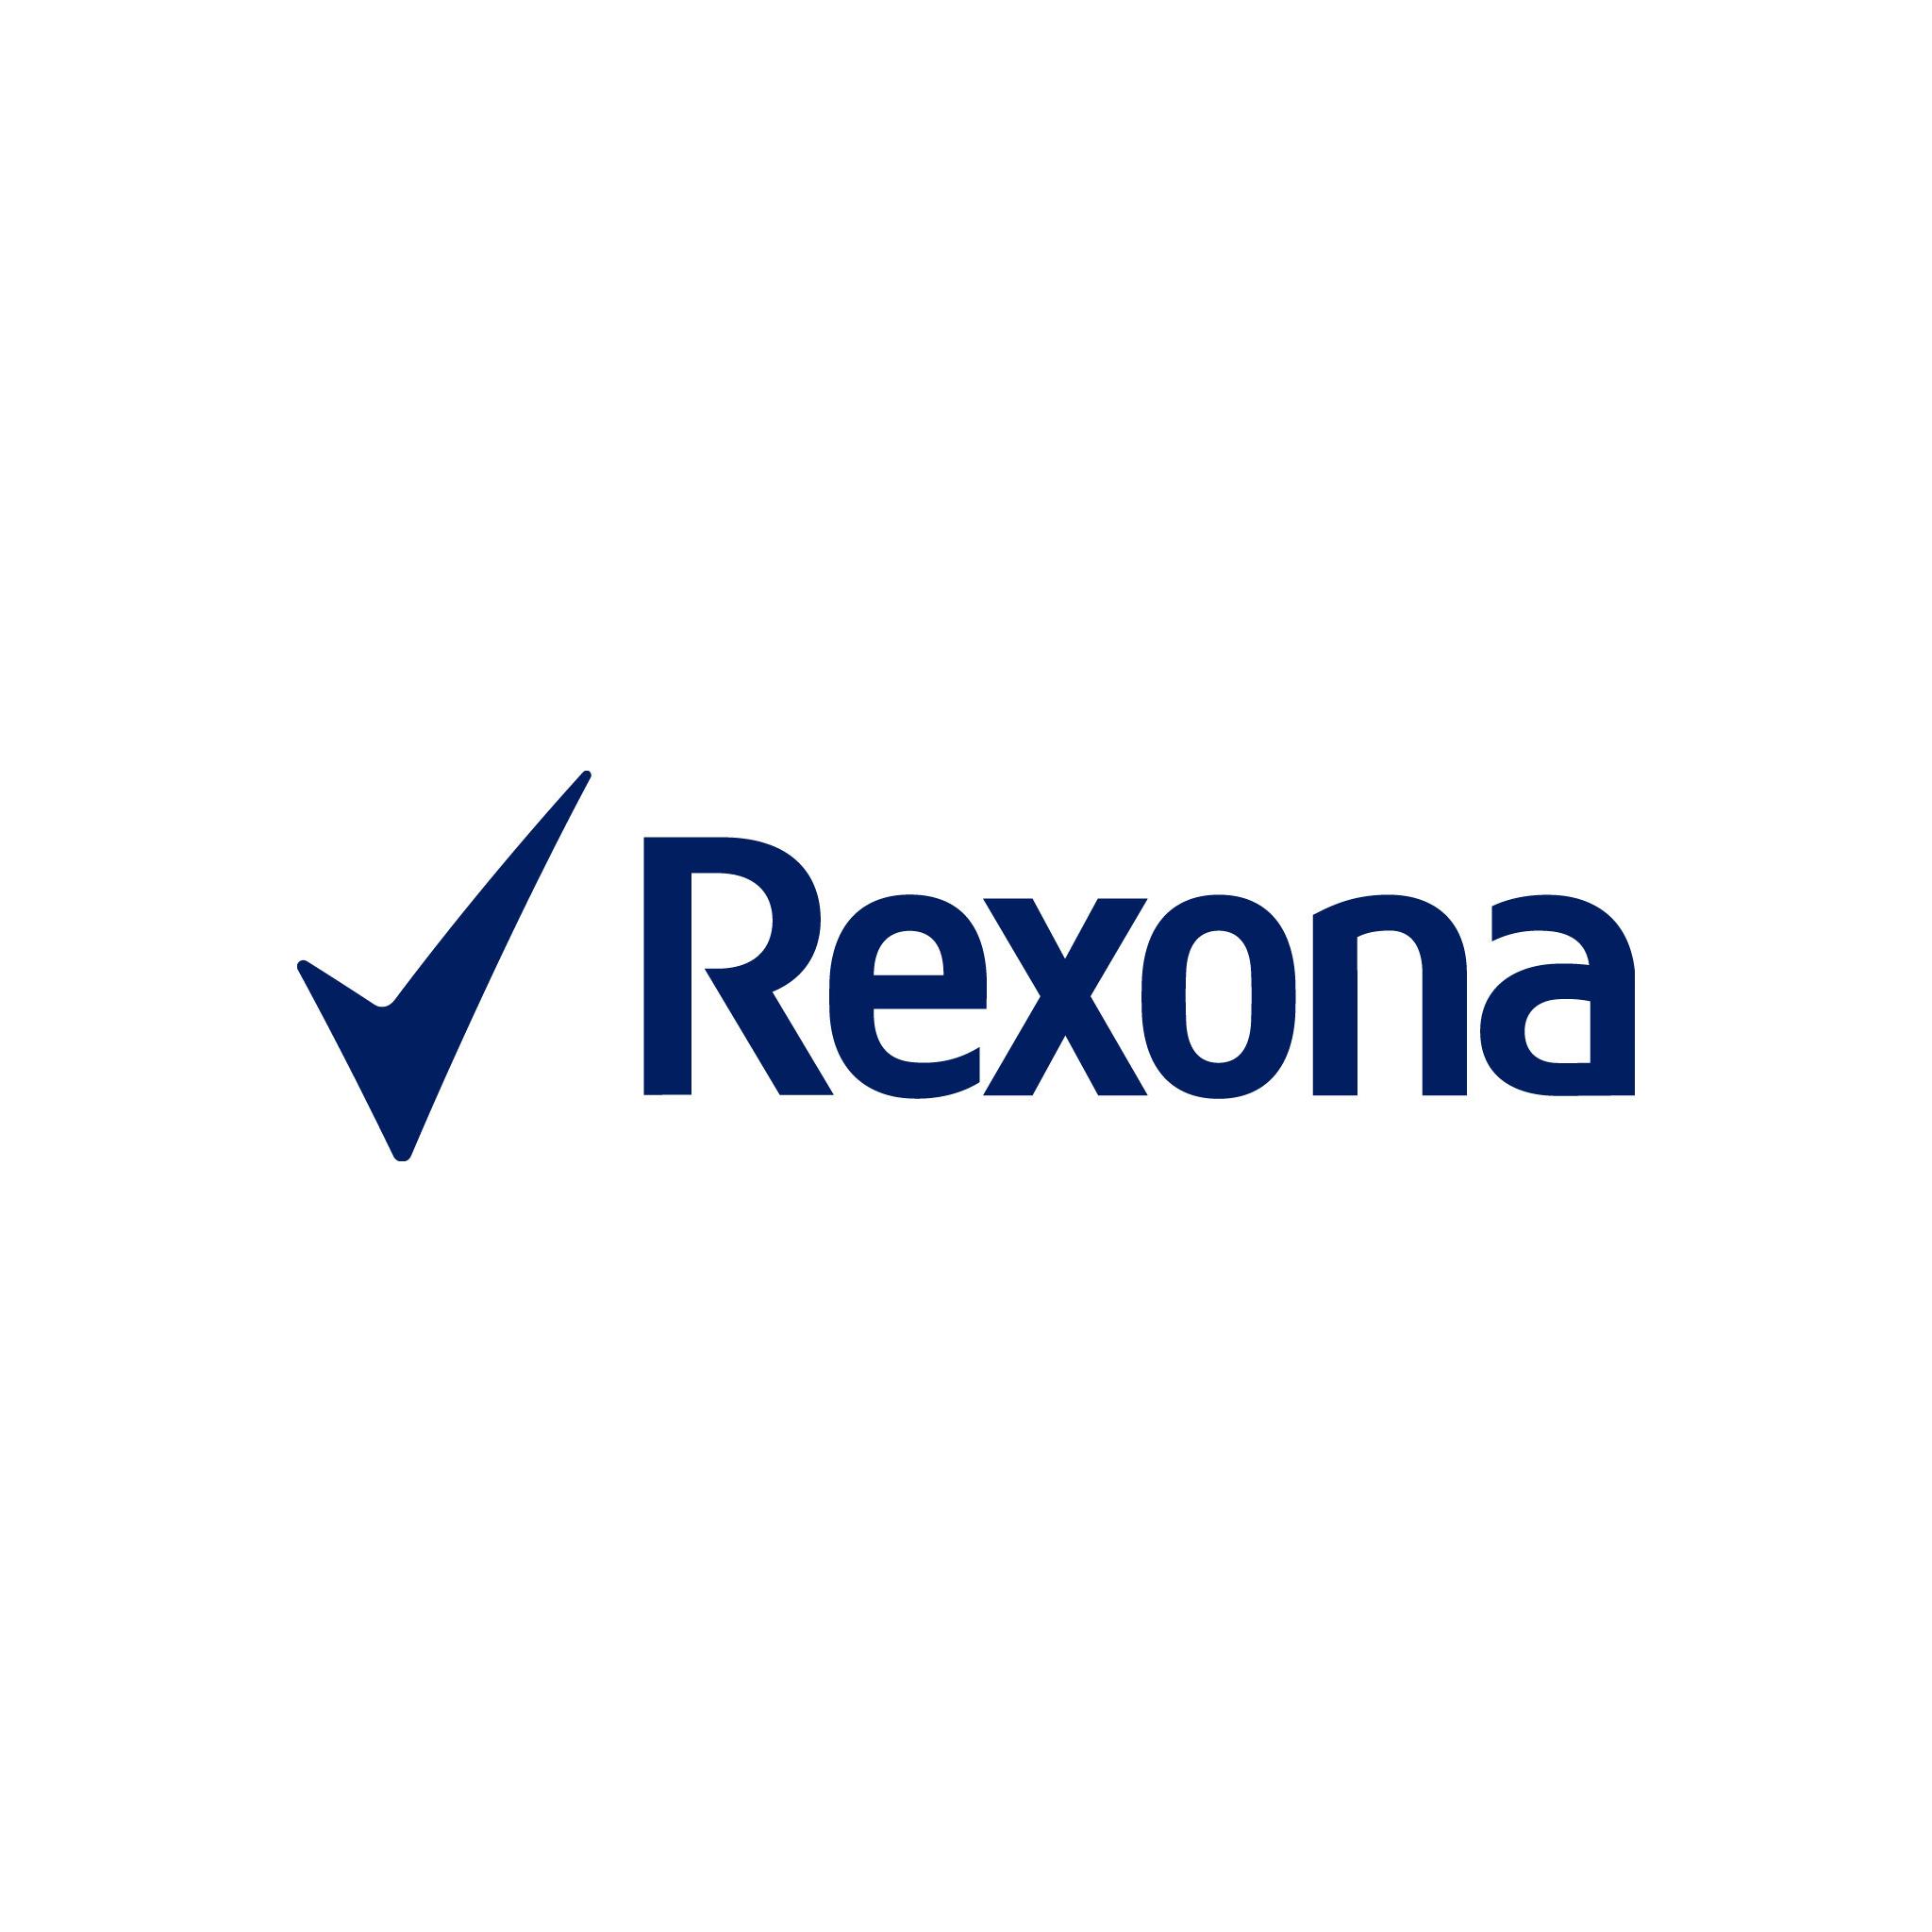 Rexona Logo